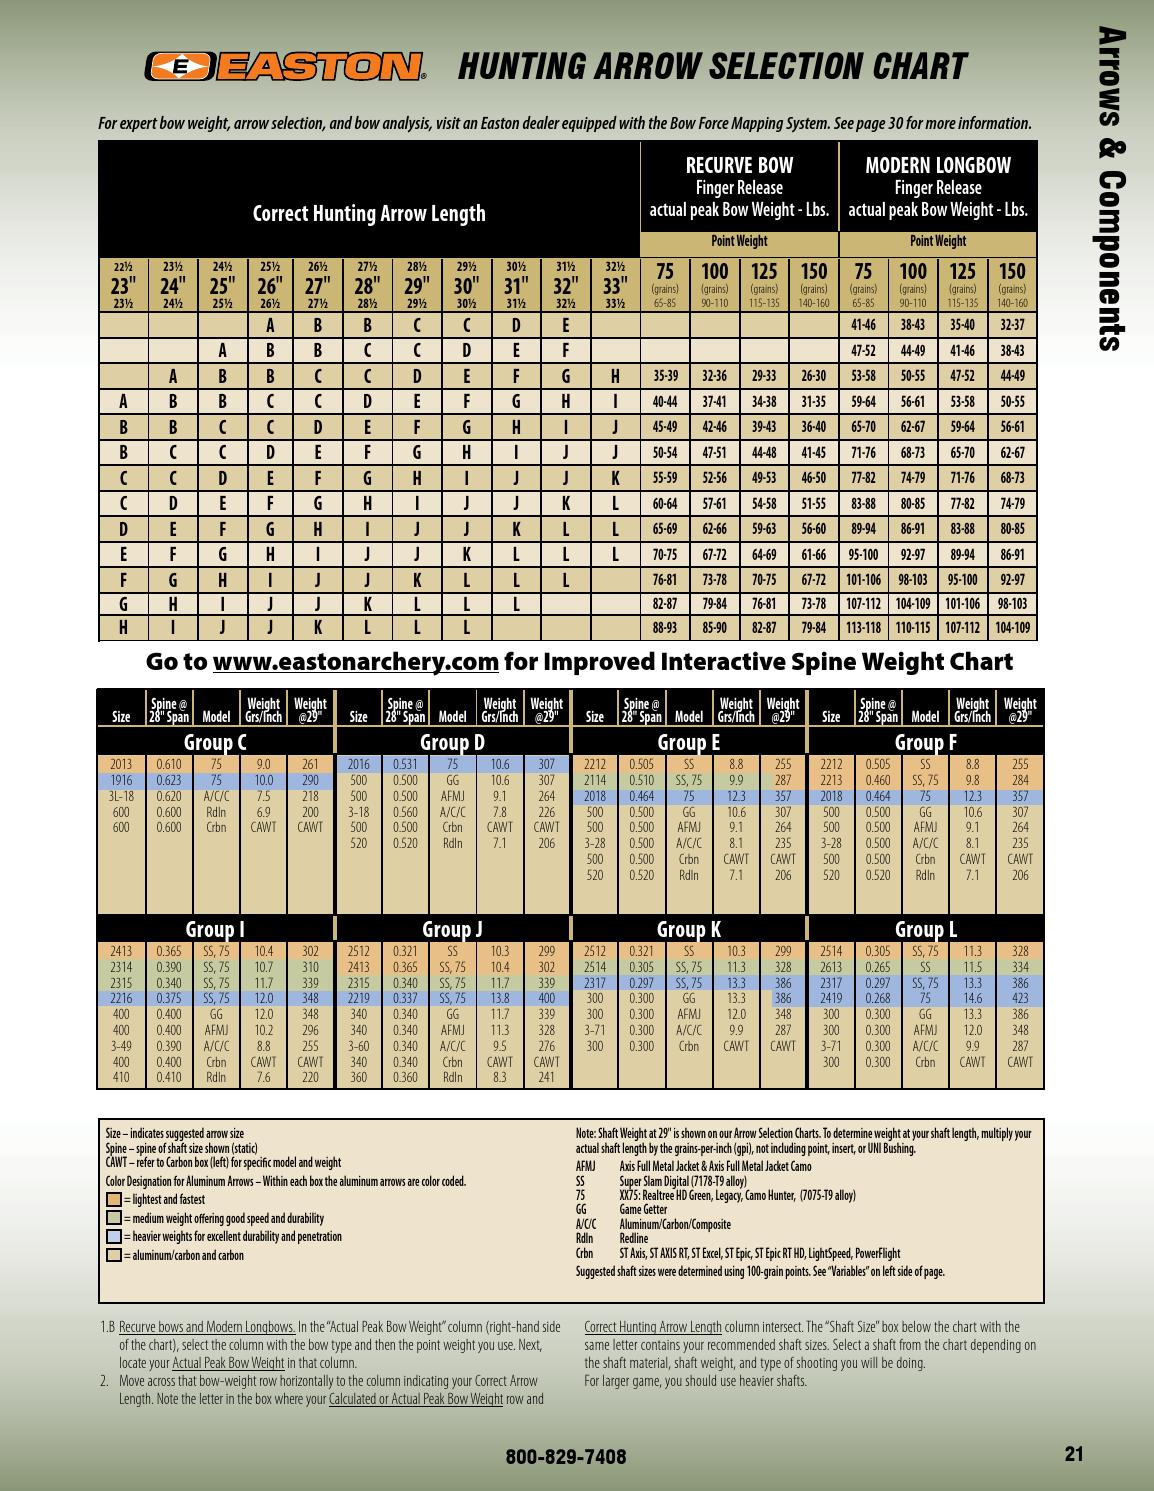 Easton Aluminum Arrow Chart : easton, aluminum, arrow, chart, Tradtech, Archery, Latest, Innovations, Traditional, ''when, First, Counts'', Goedertier, Issuu